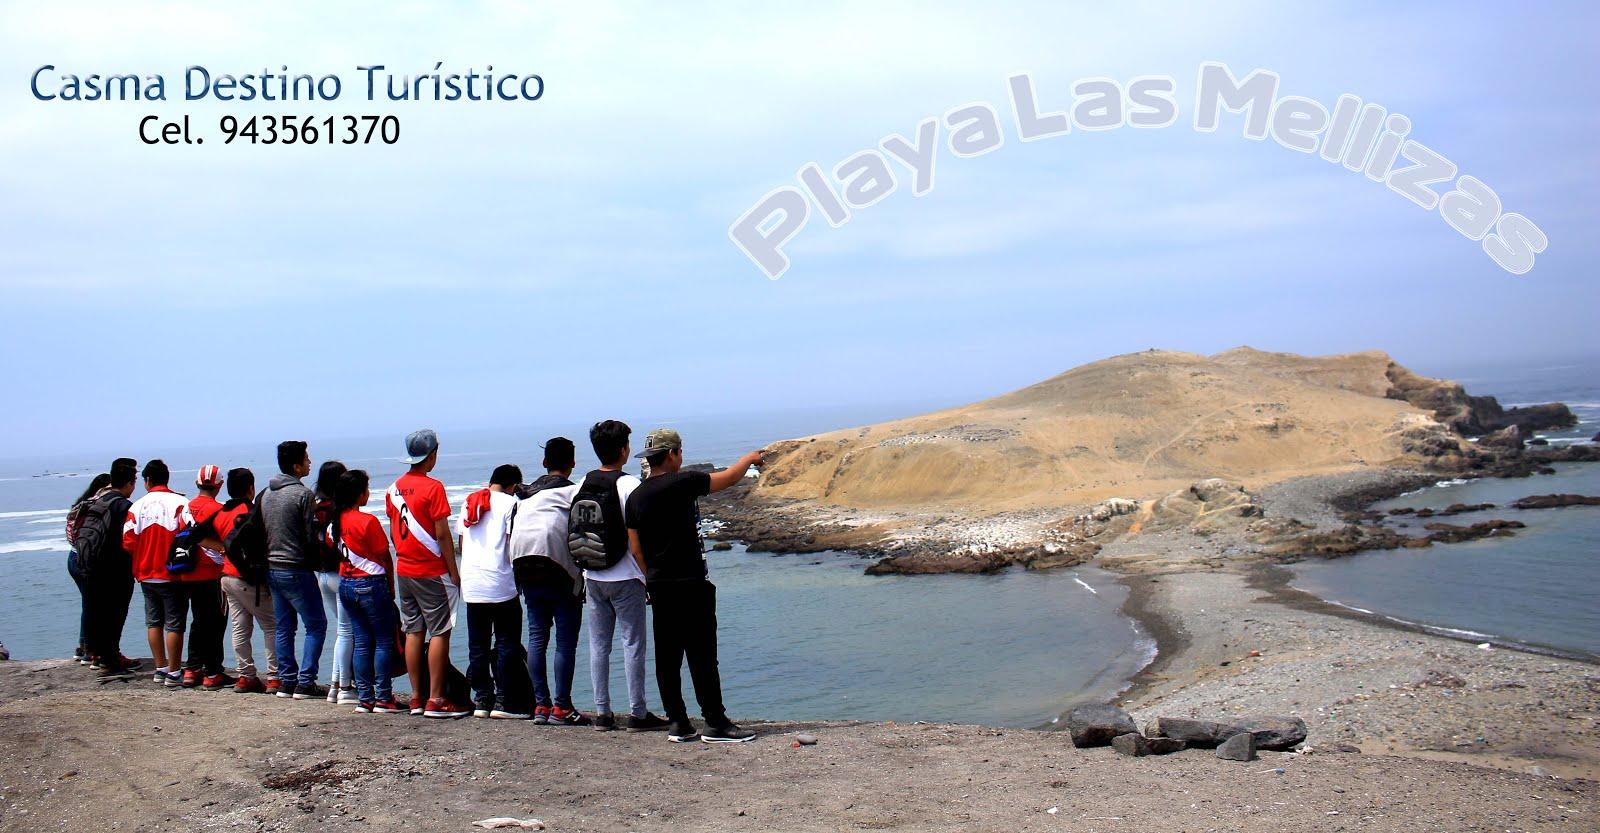 Playa Las Mellizas